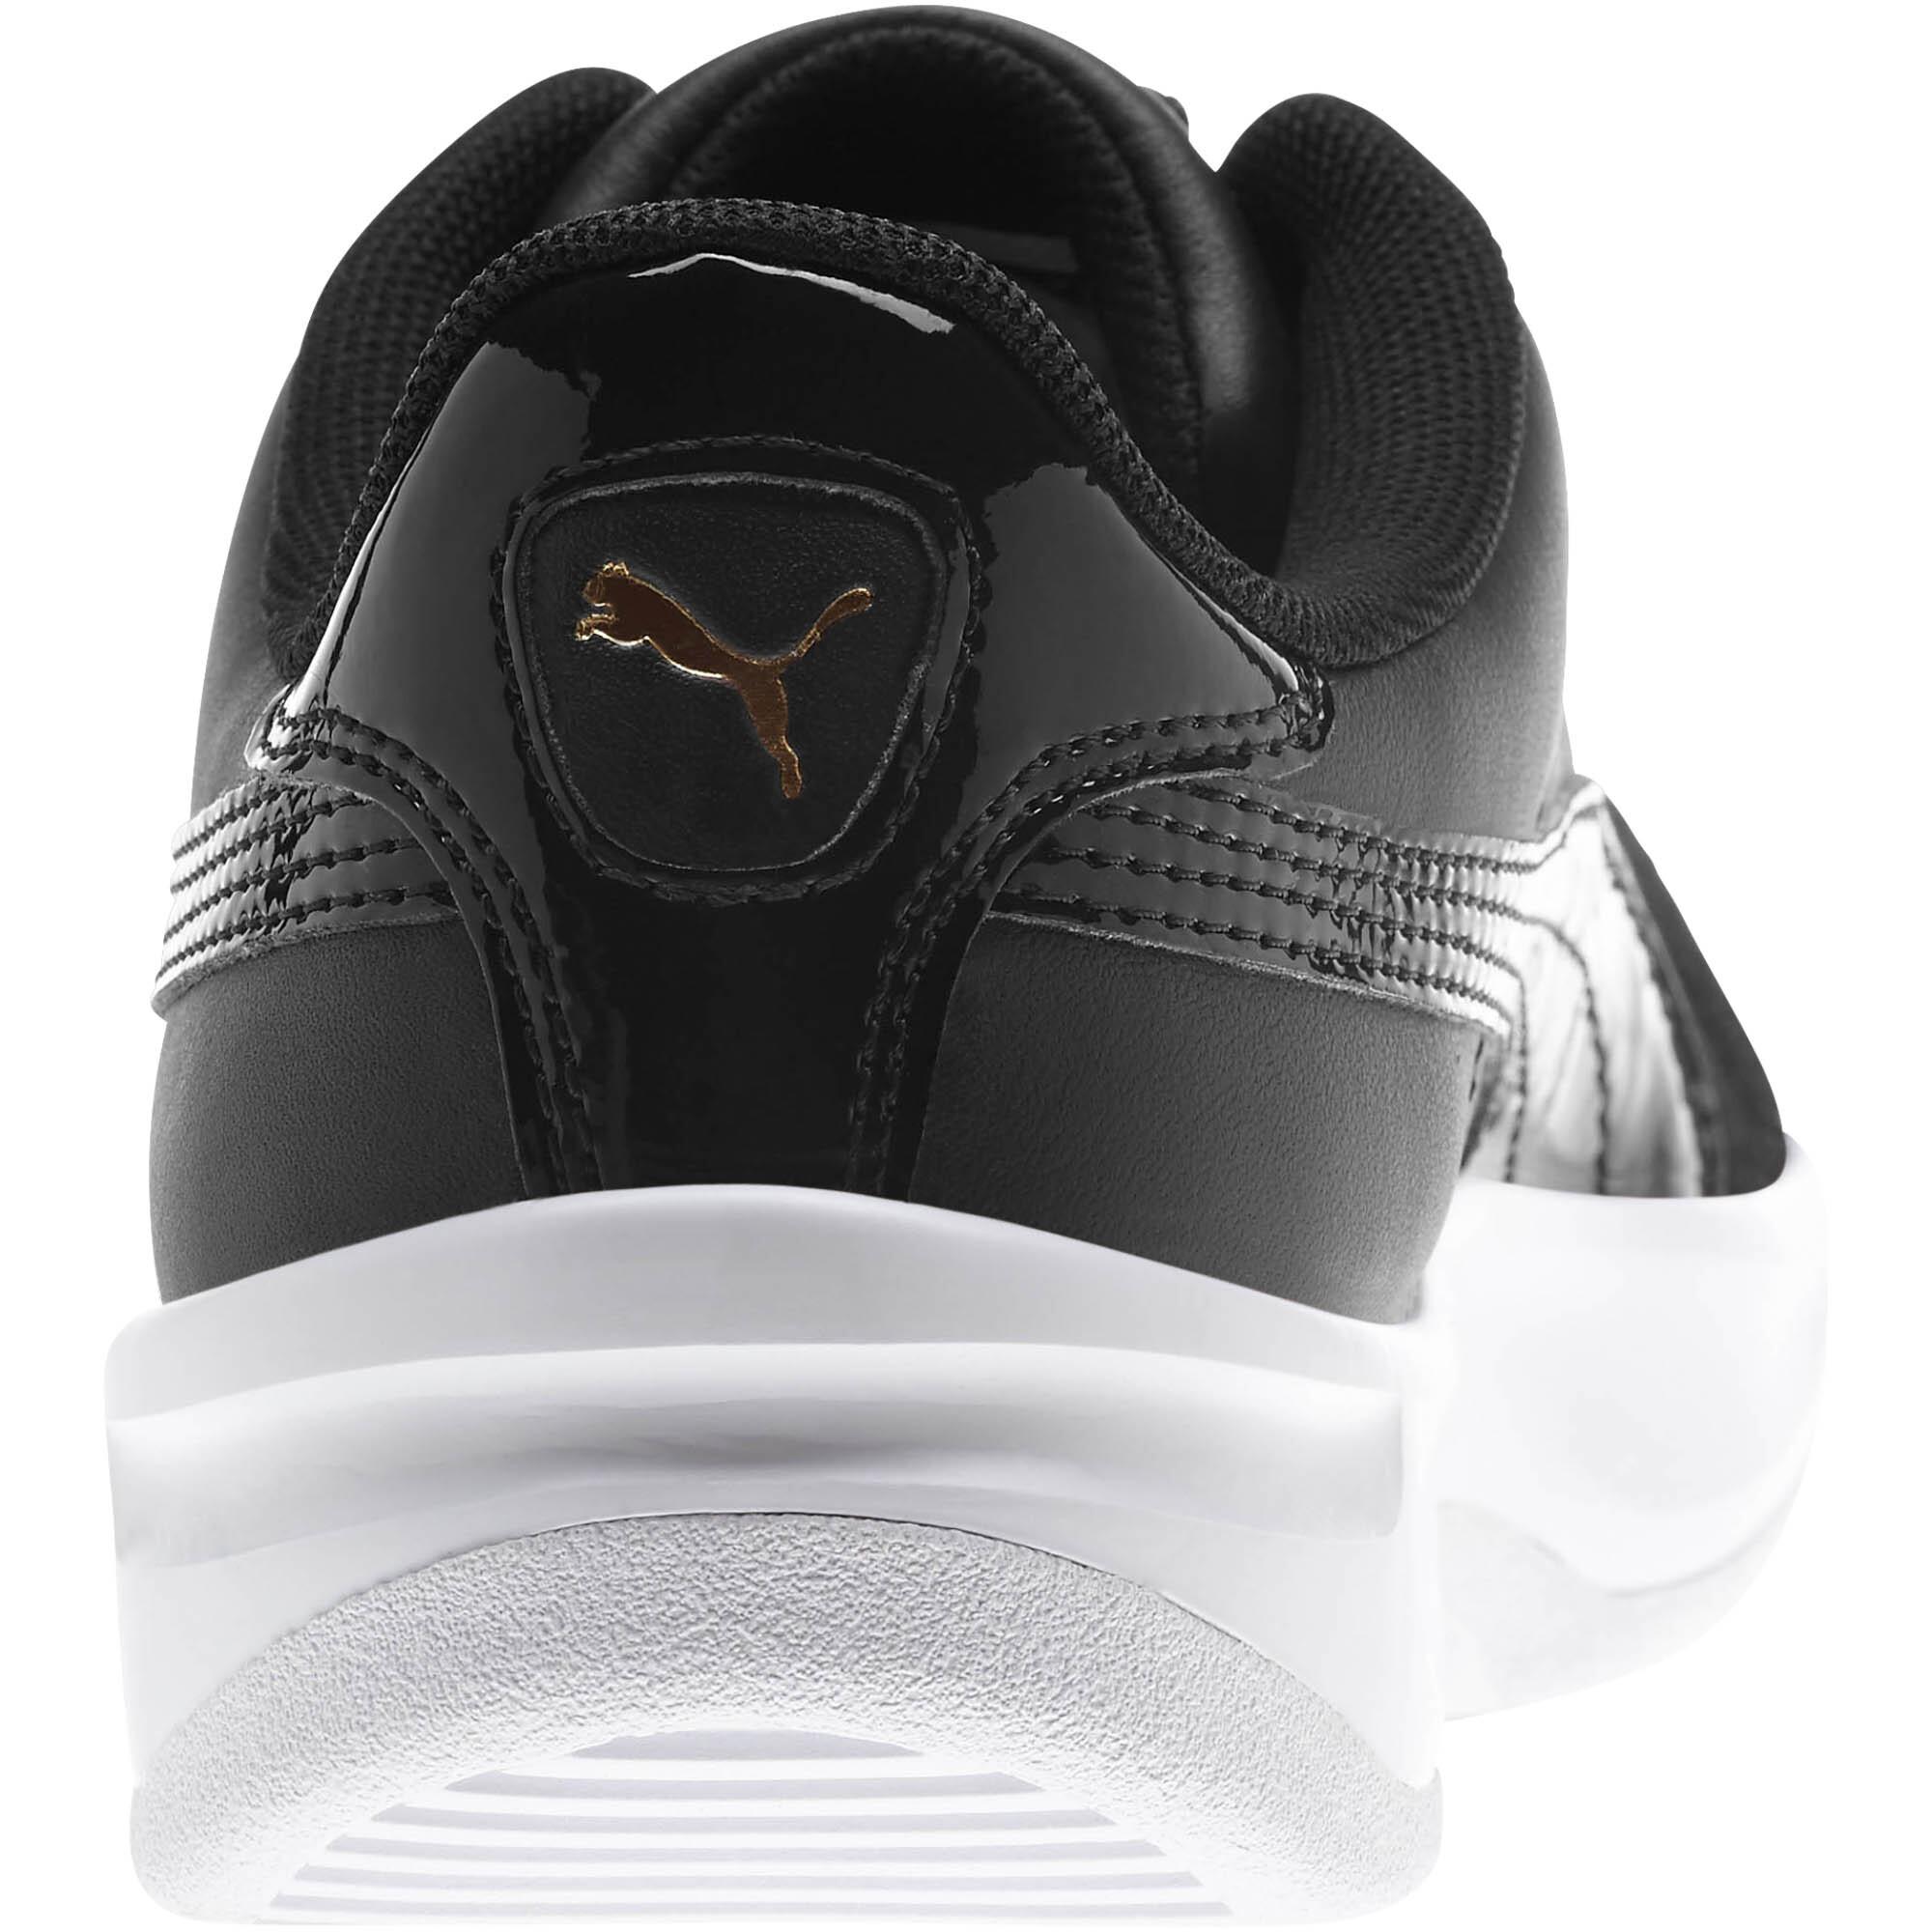 PUMA-Women-039-s-California-Monochrome-Sneakers thumbnail 3